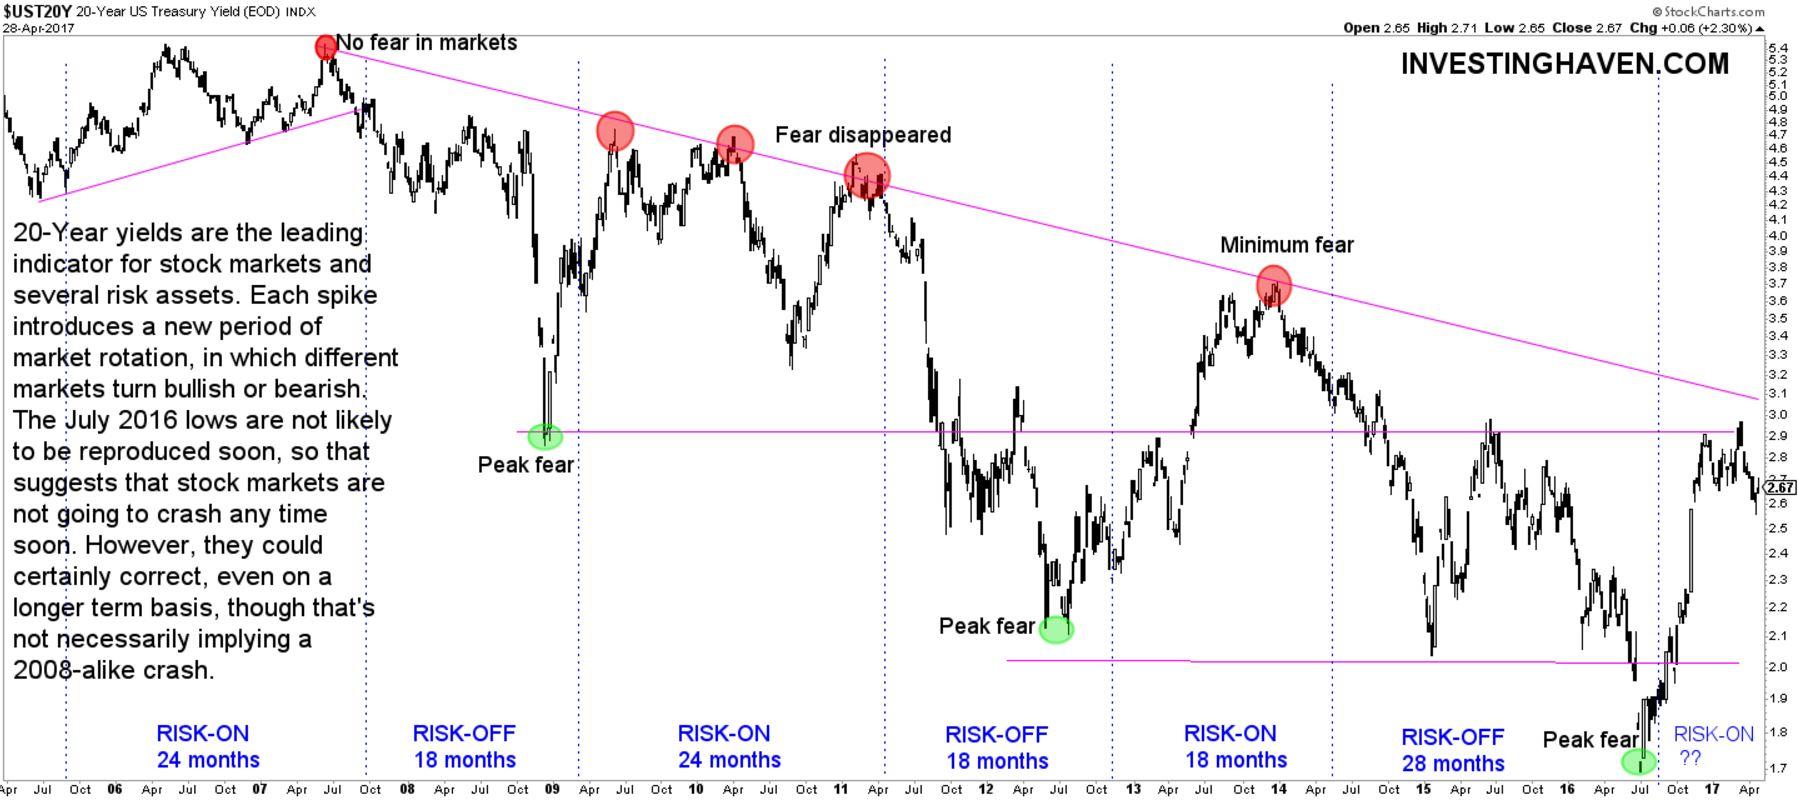 market barometer yields